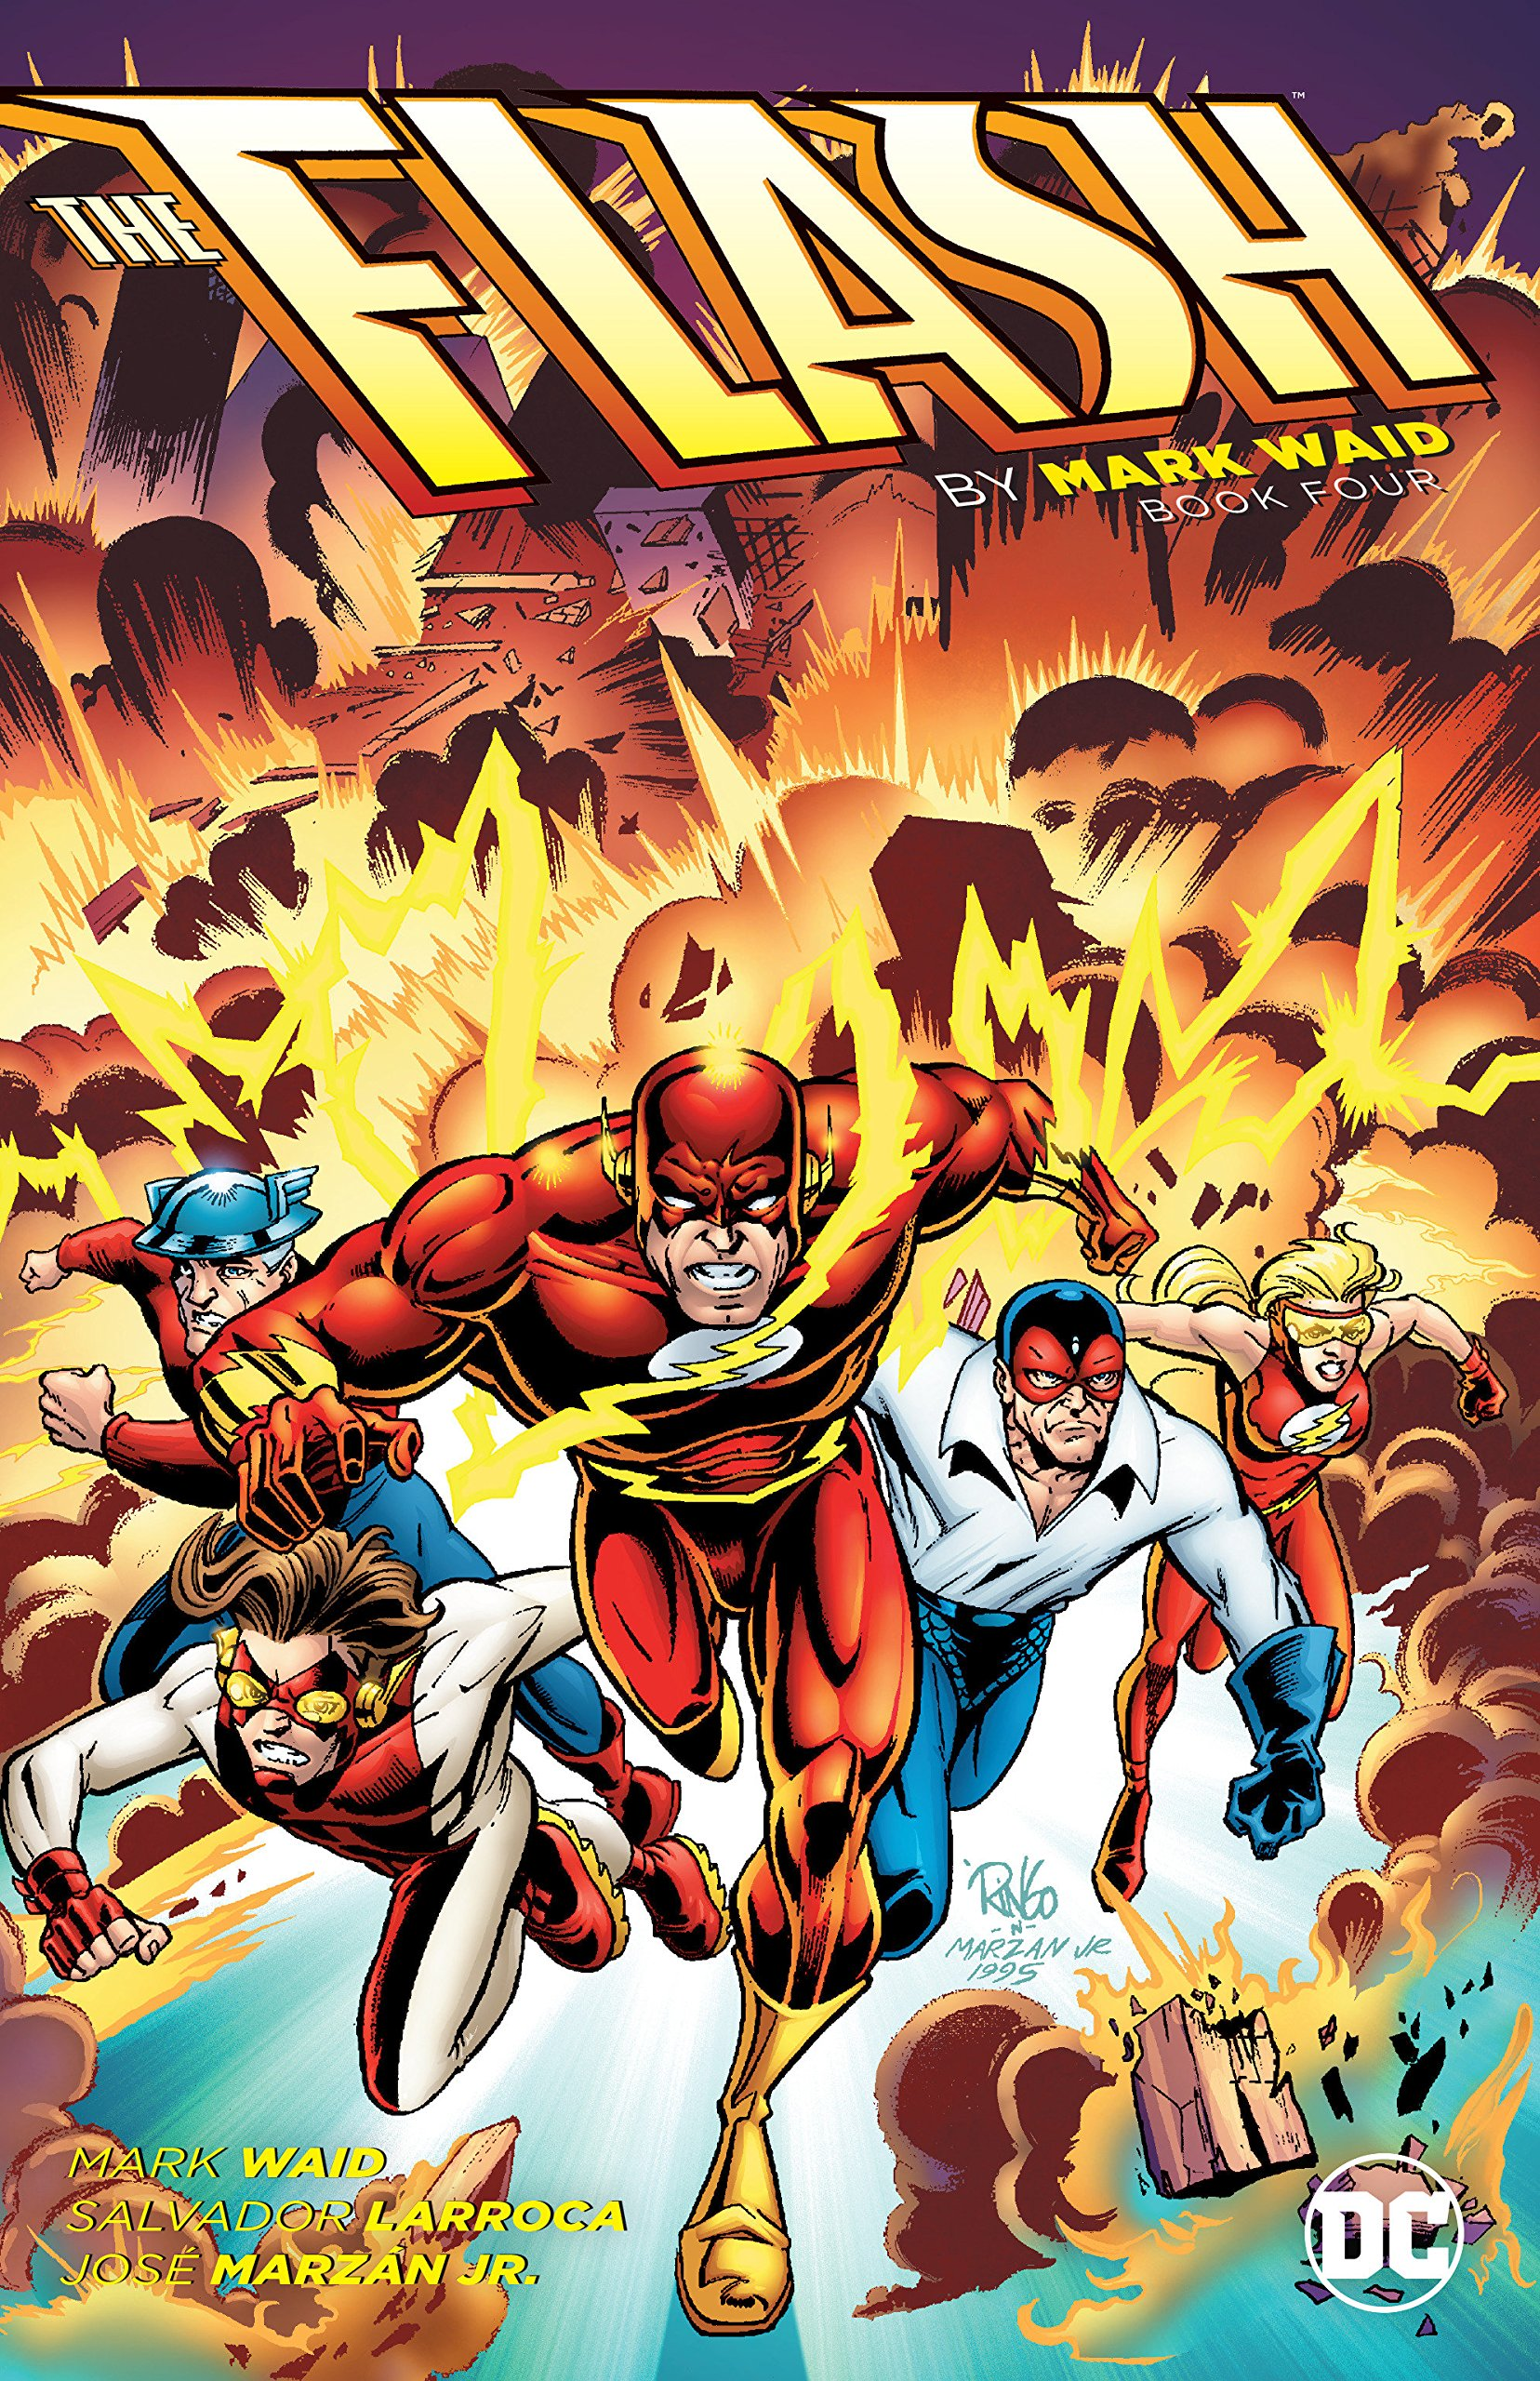 The Flash by Mark Waid Book Four ebook